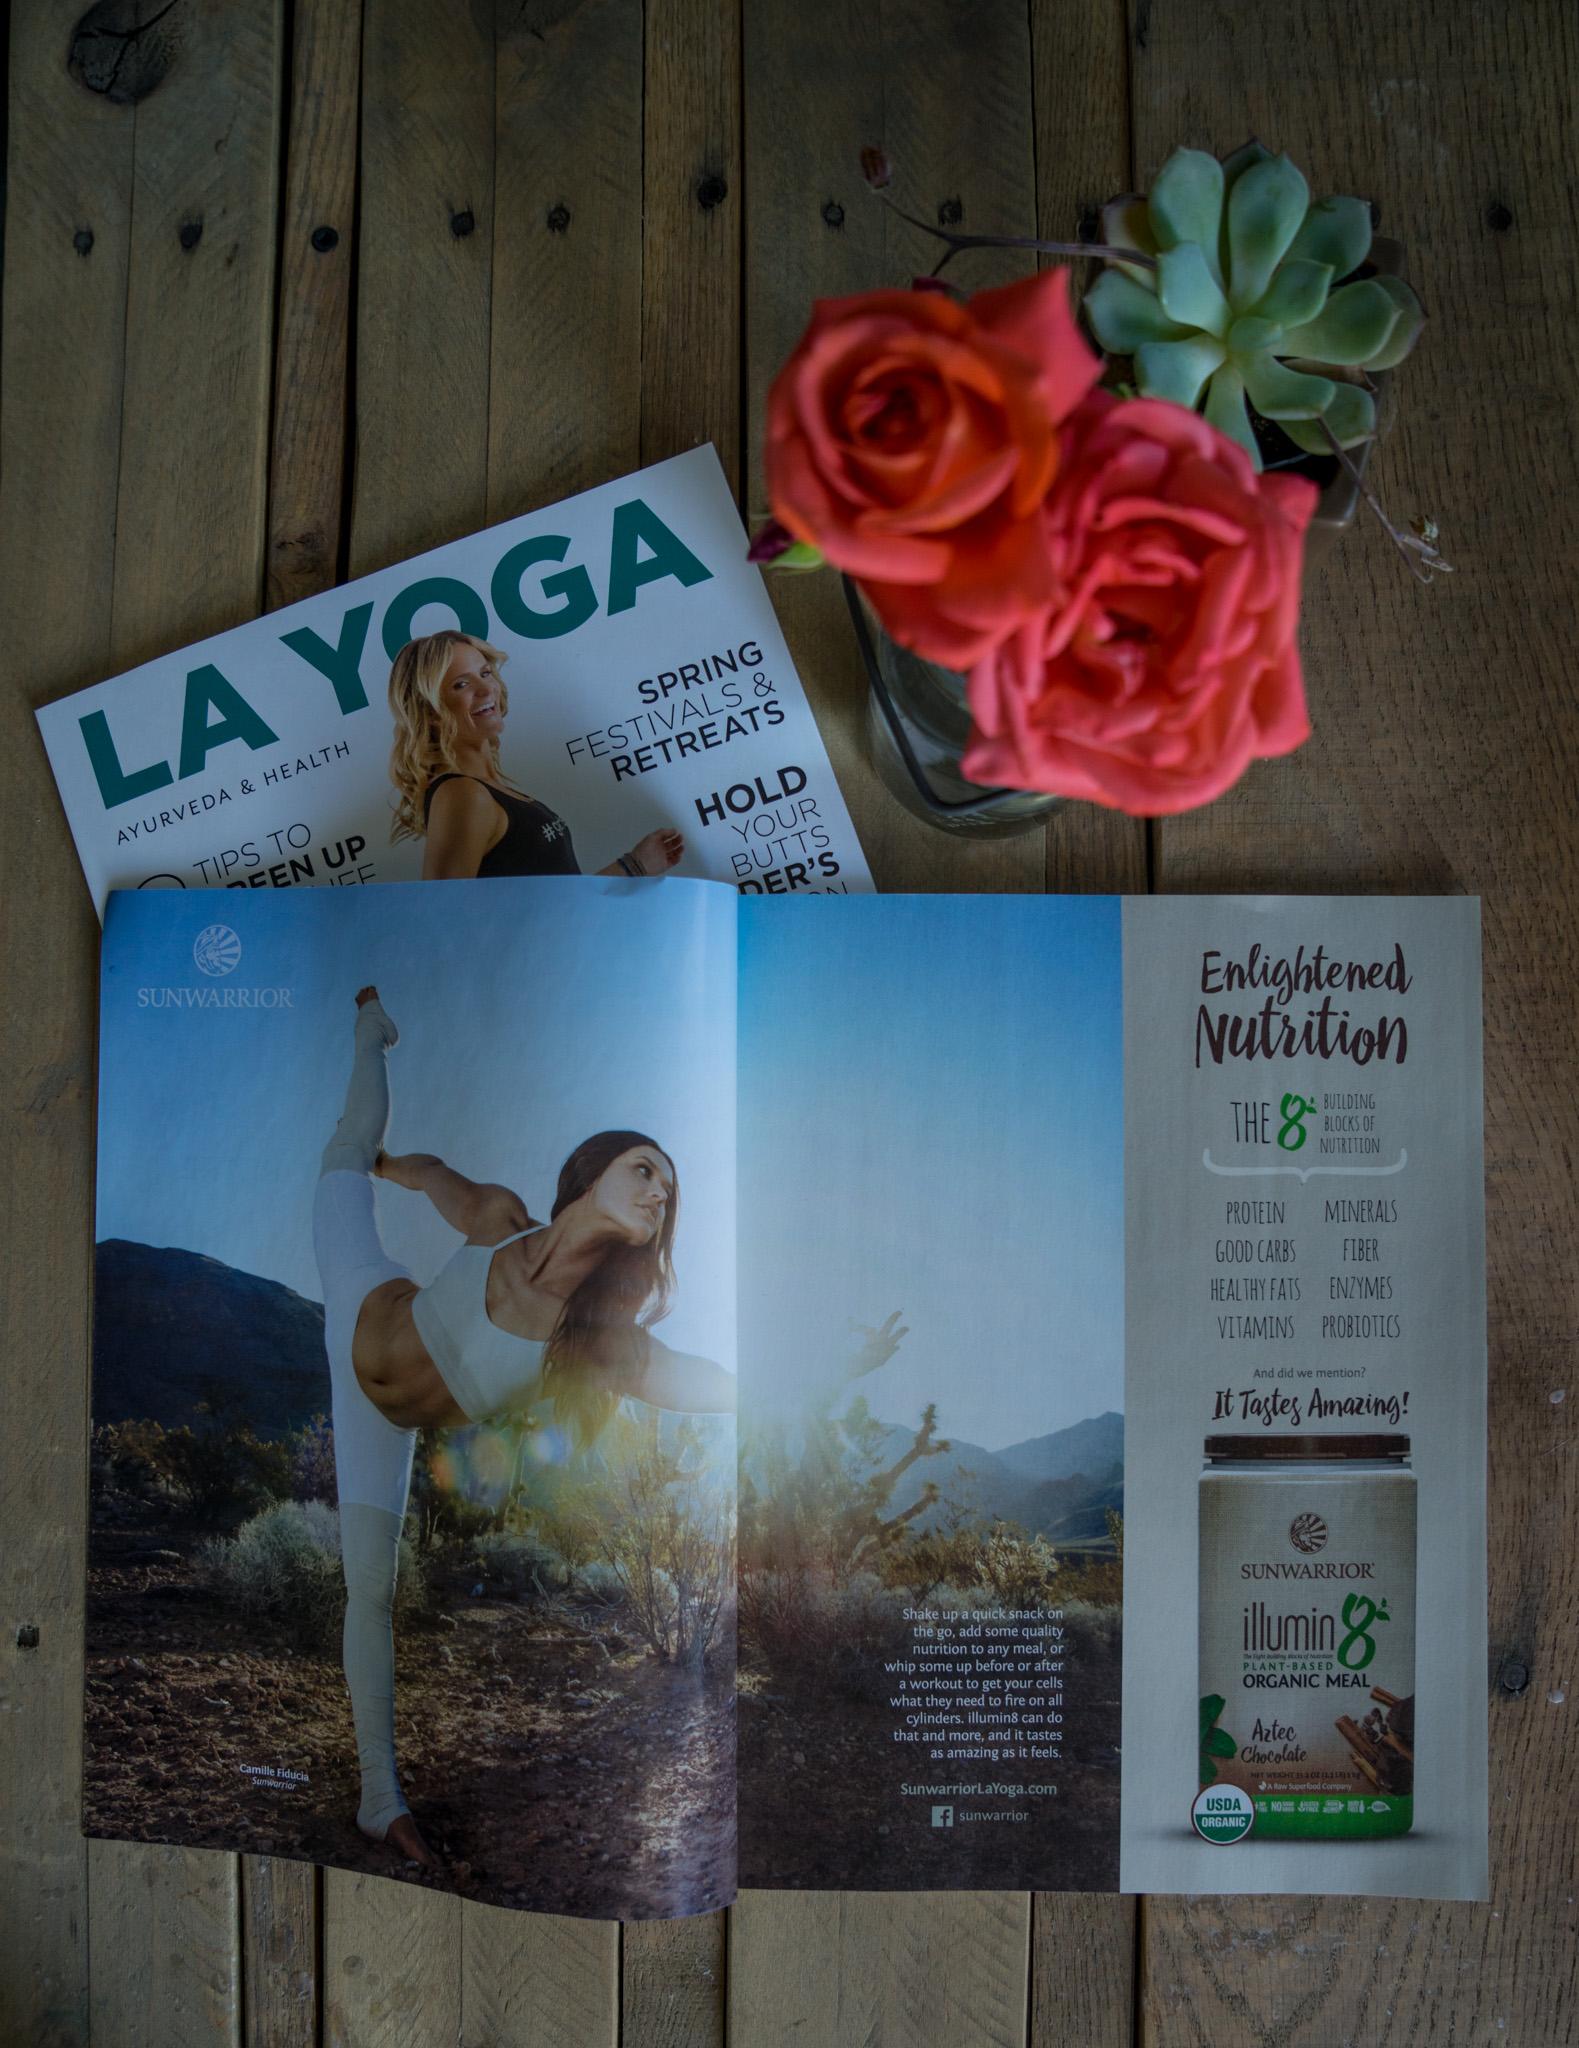 Camille in LA Yoga 3 (1 of 1)